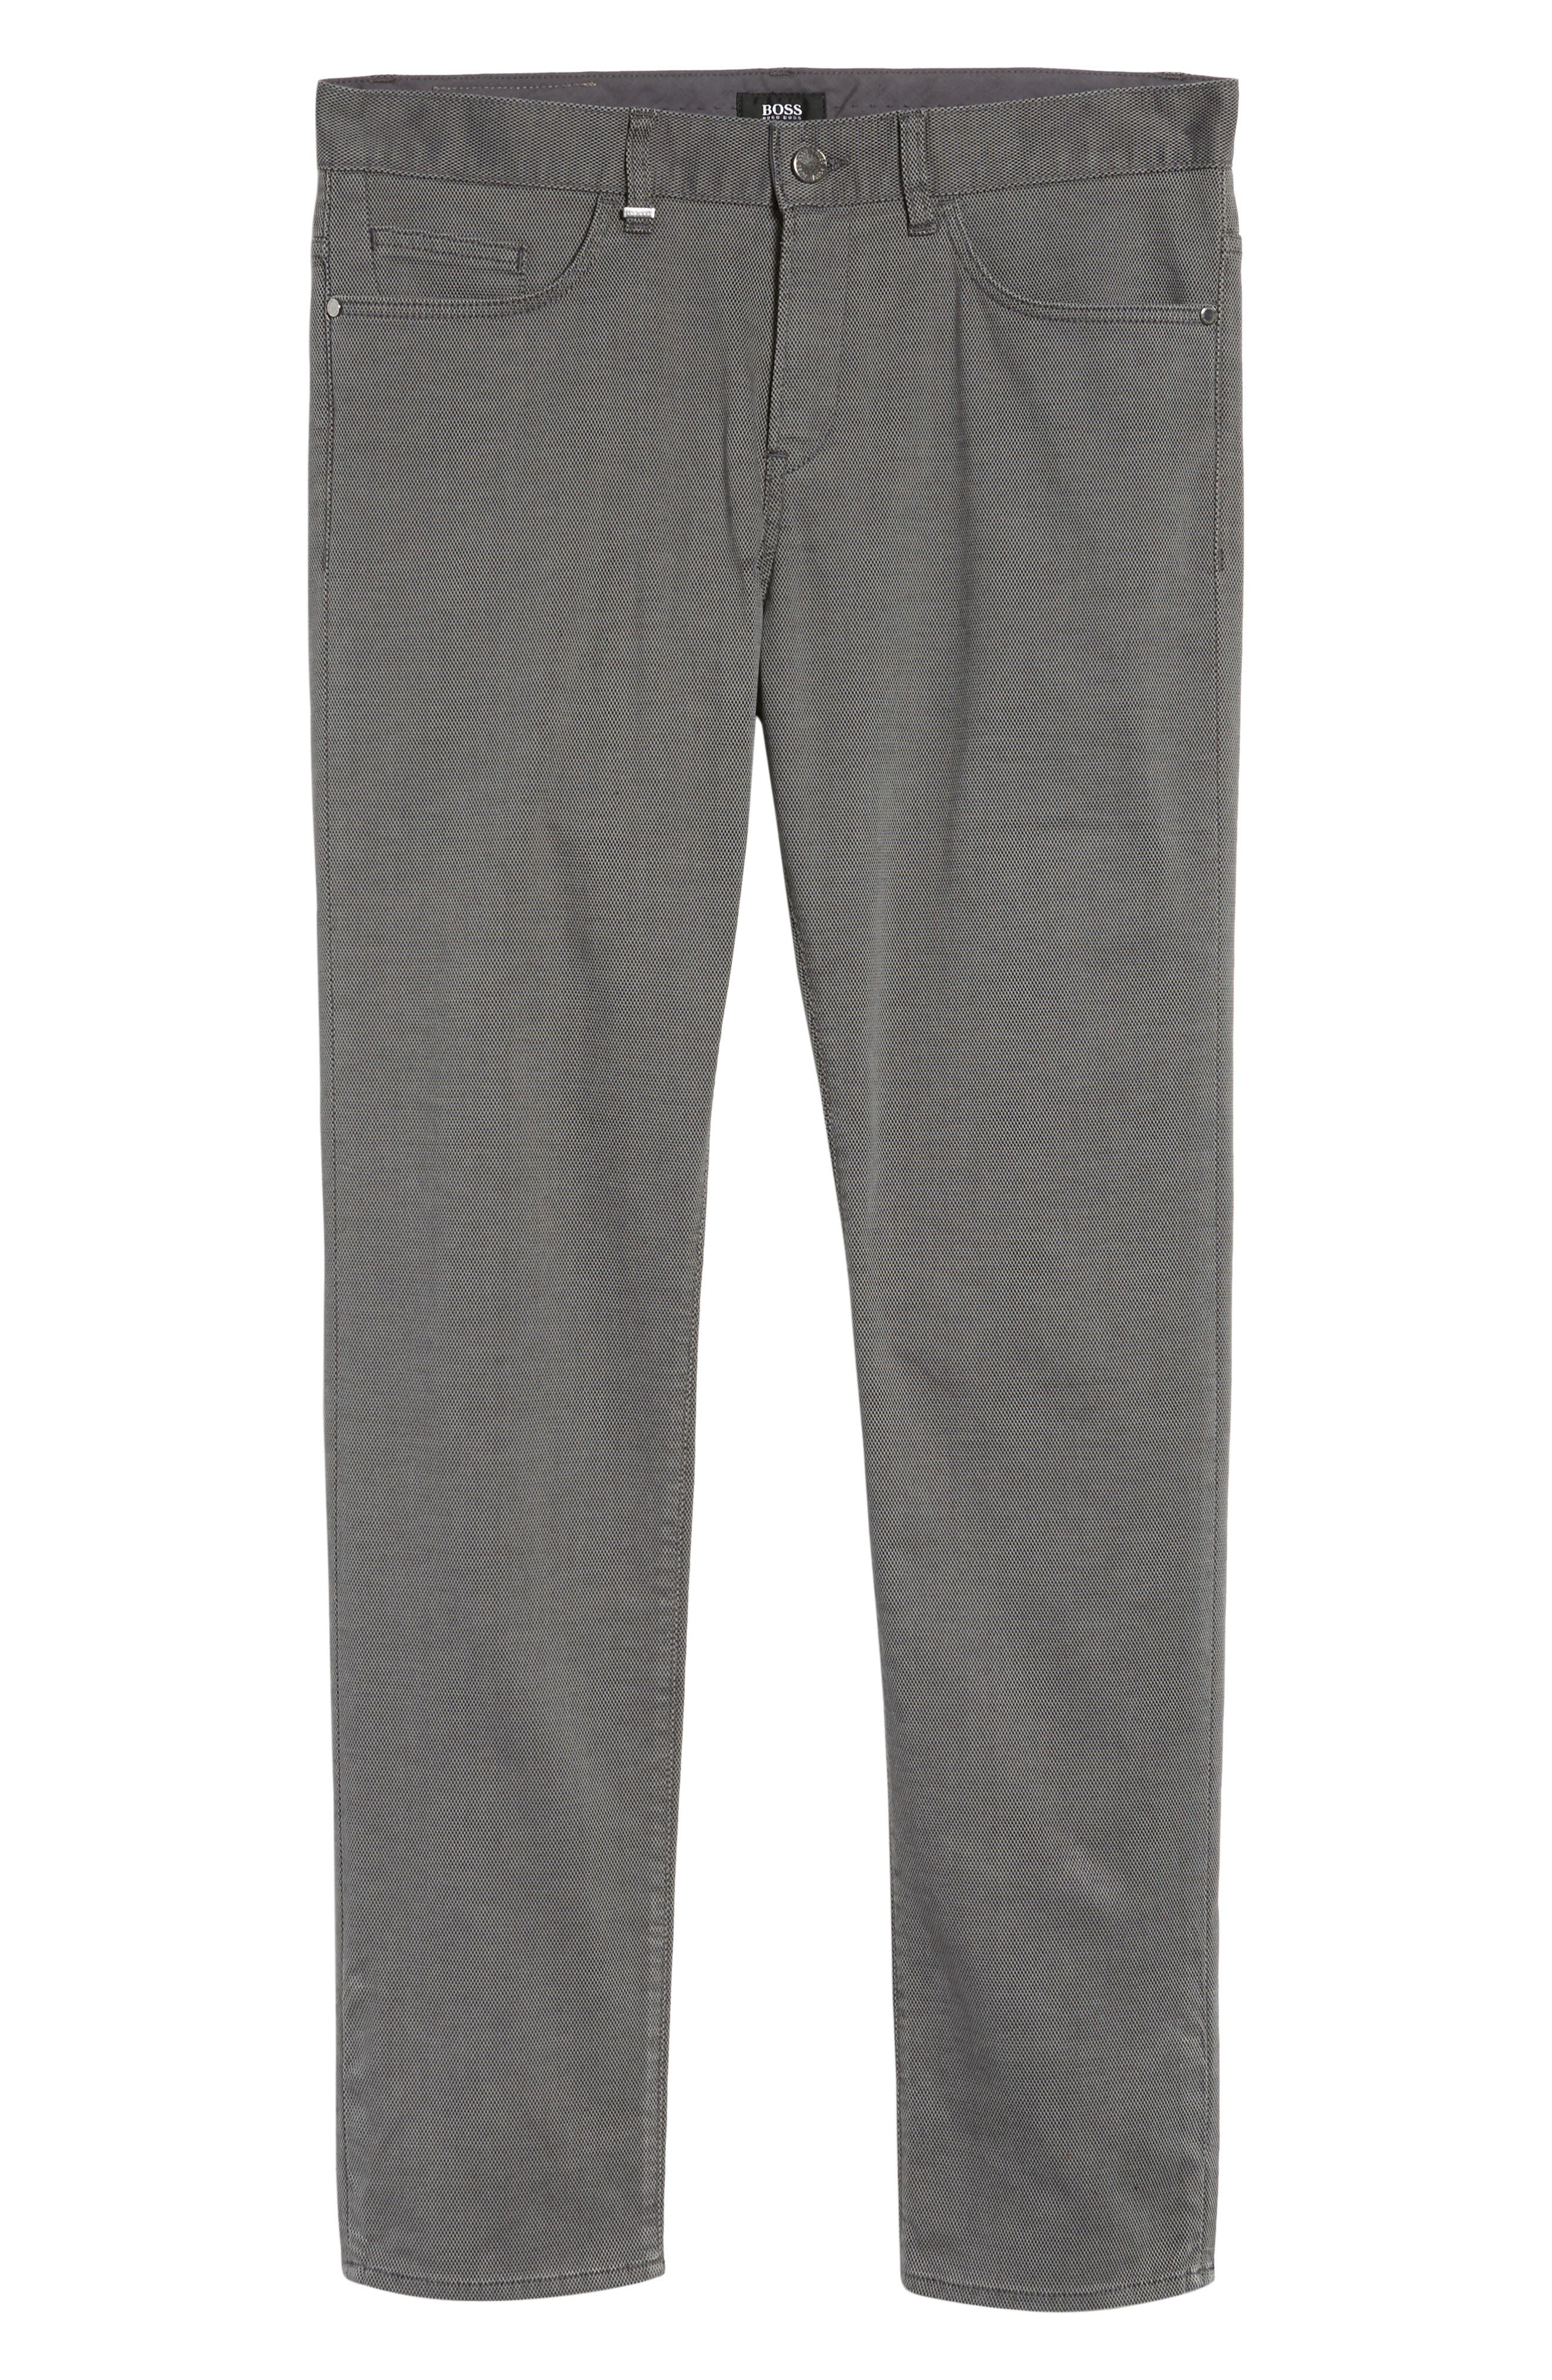 Delaware Slim Fit Structure Jeans,                             Alternate thumbnail 10, color,                             Grey